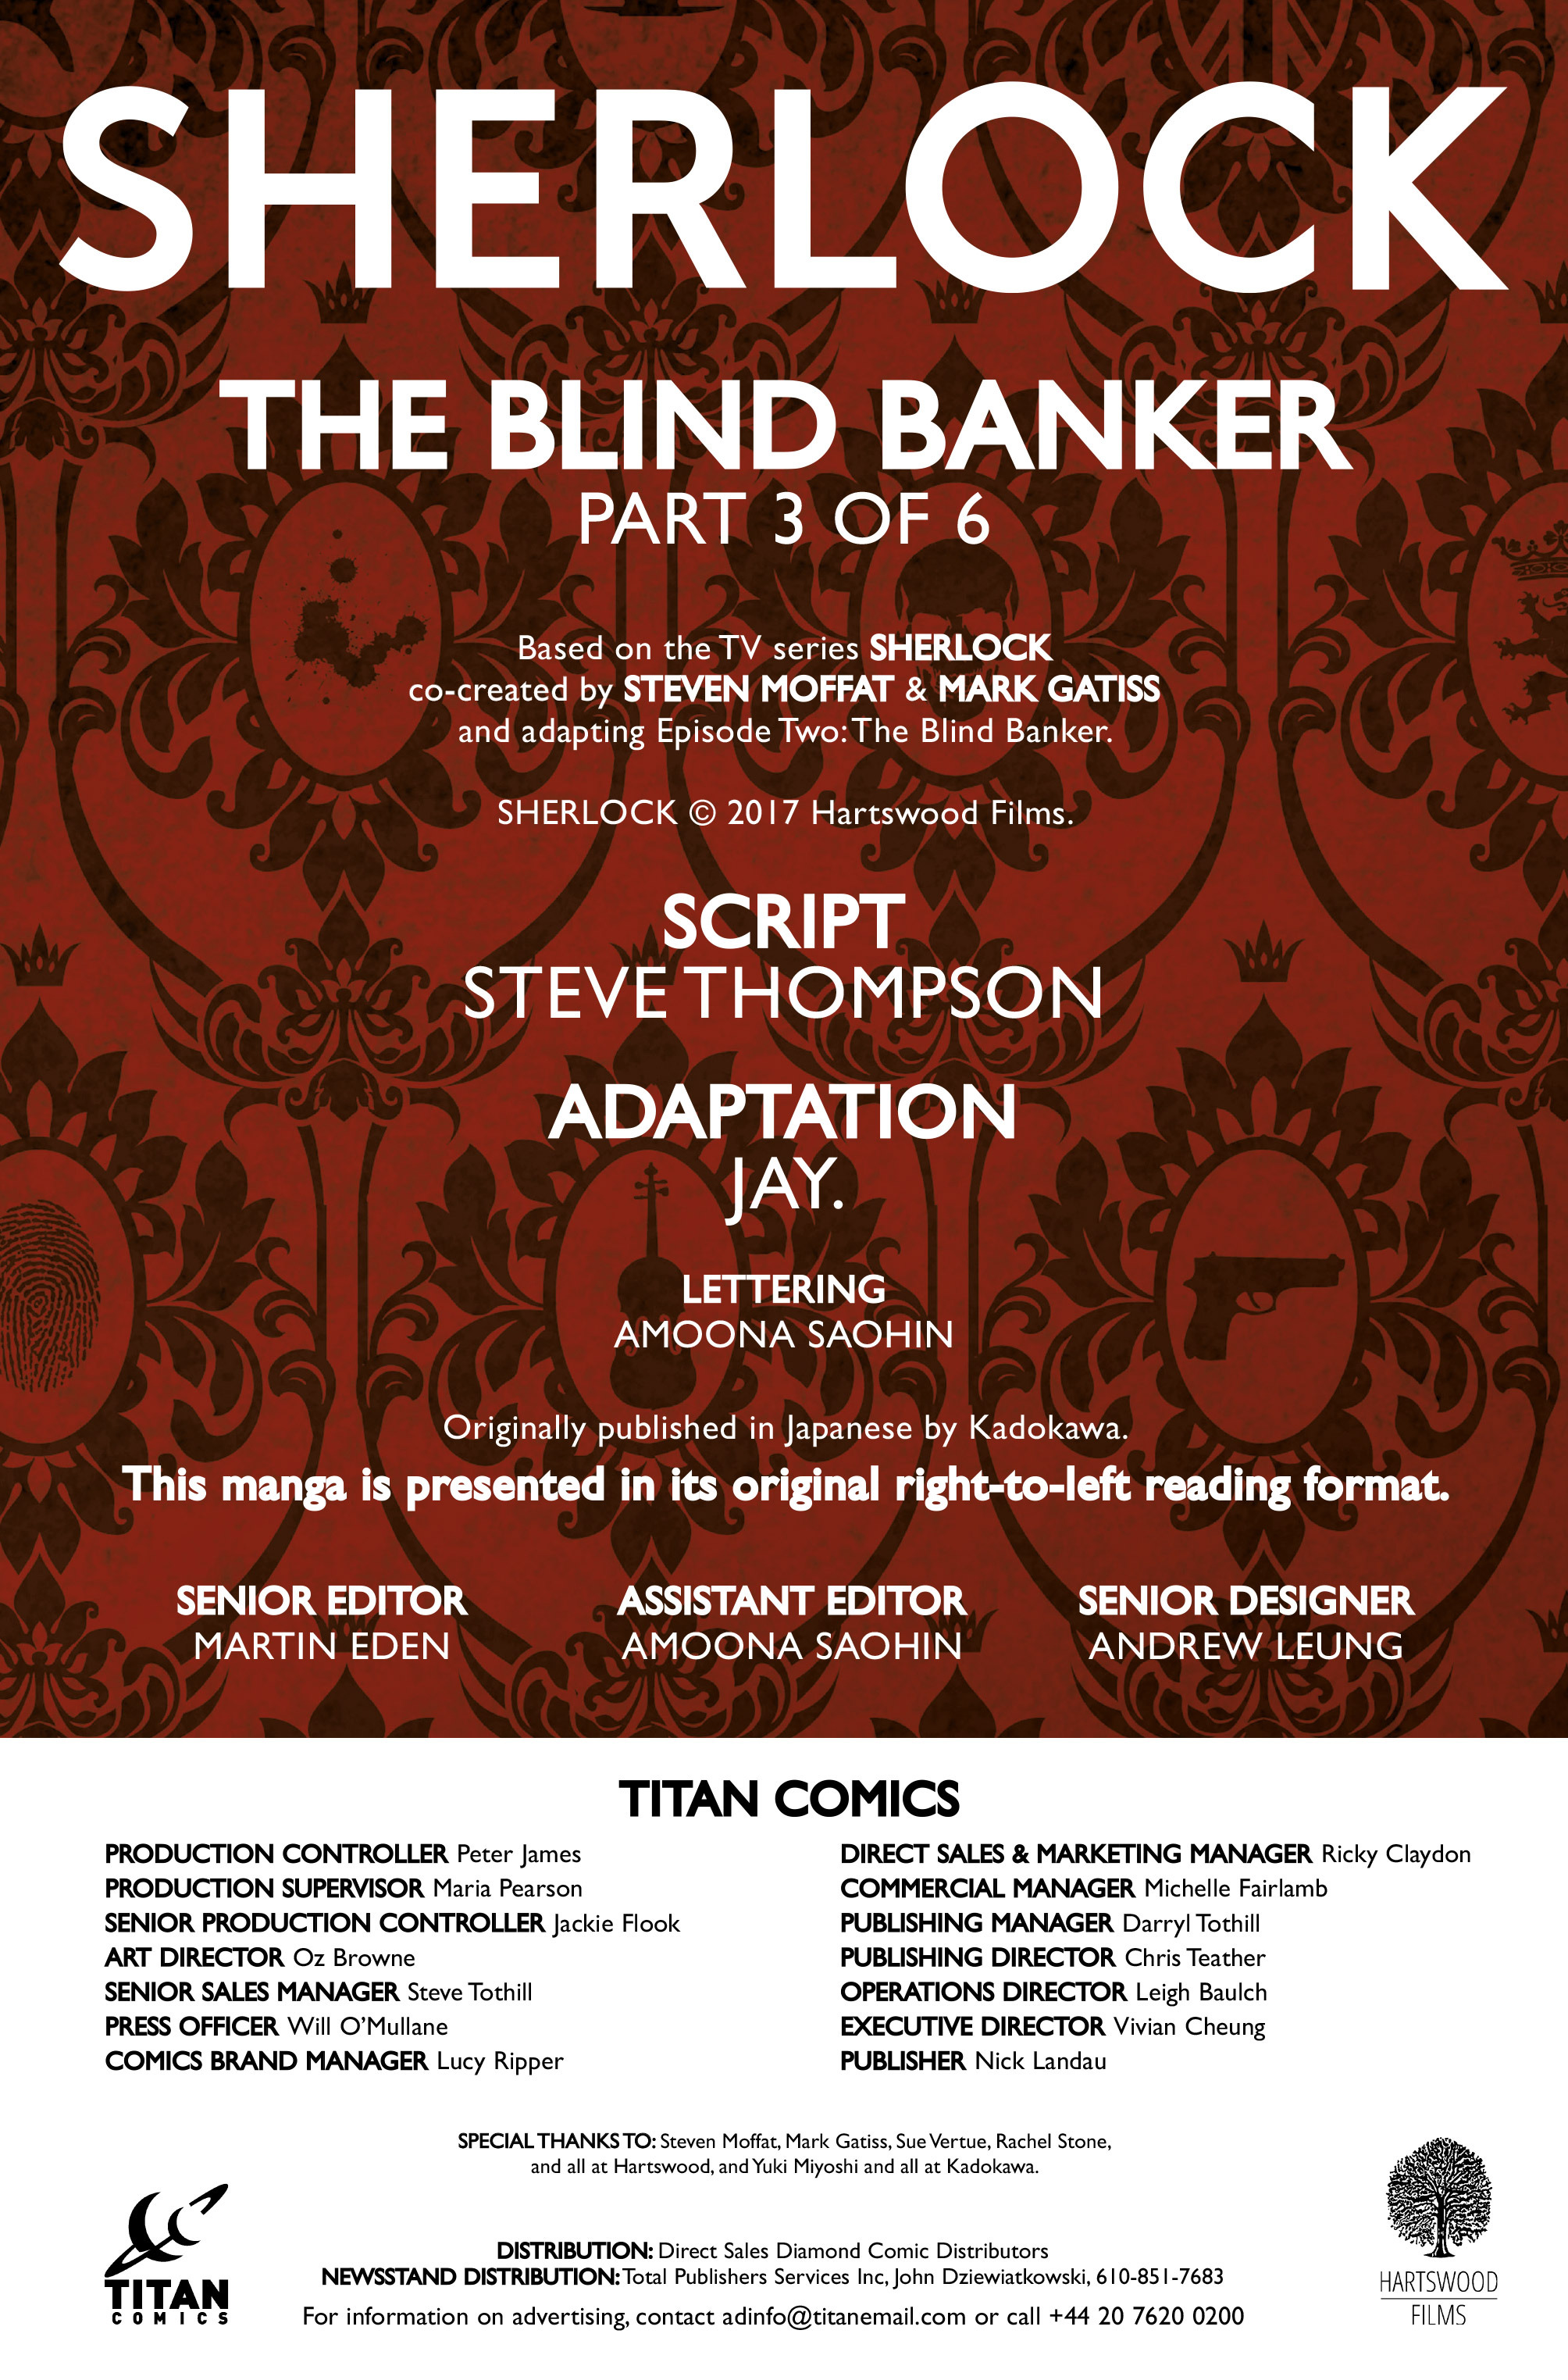 Read online Sherlock: The Blind Banker comic -  Issue #3 - 6